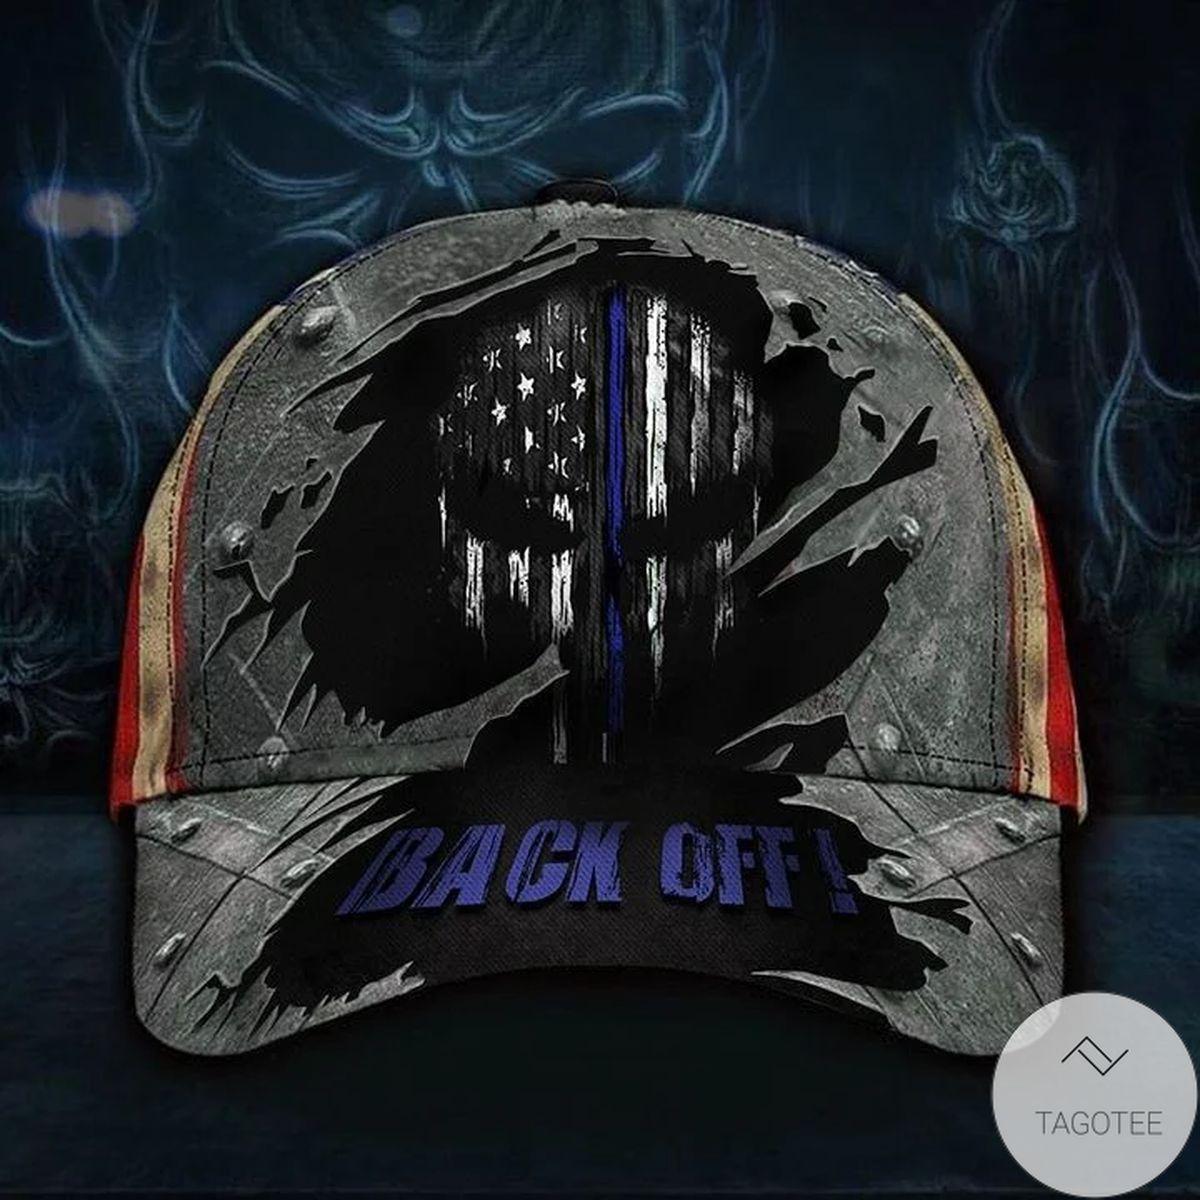 Us Store Skull Thin Blue Line Back Off Hat Vintage USA Flag Cap Back The Blue Honor Law Enforcement